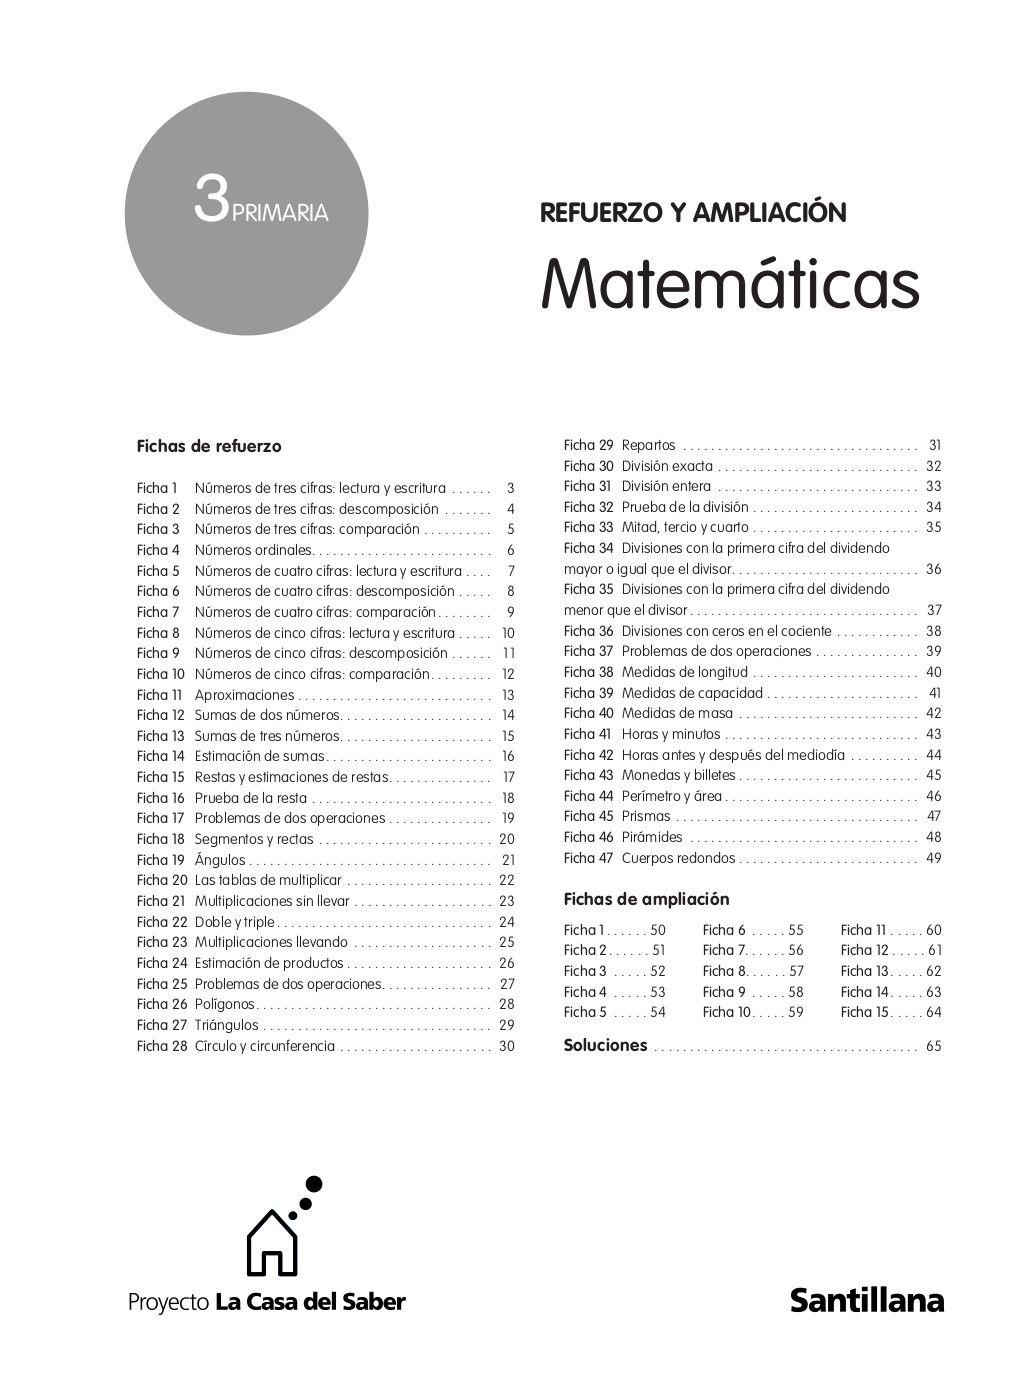 3º prim matematicas refuerzo y ampliacion santillana by aaspms via  slideshare